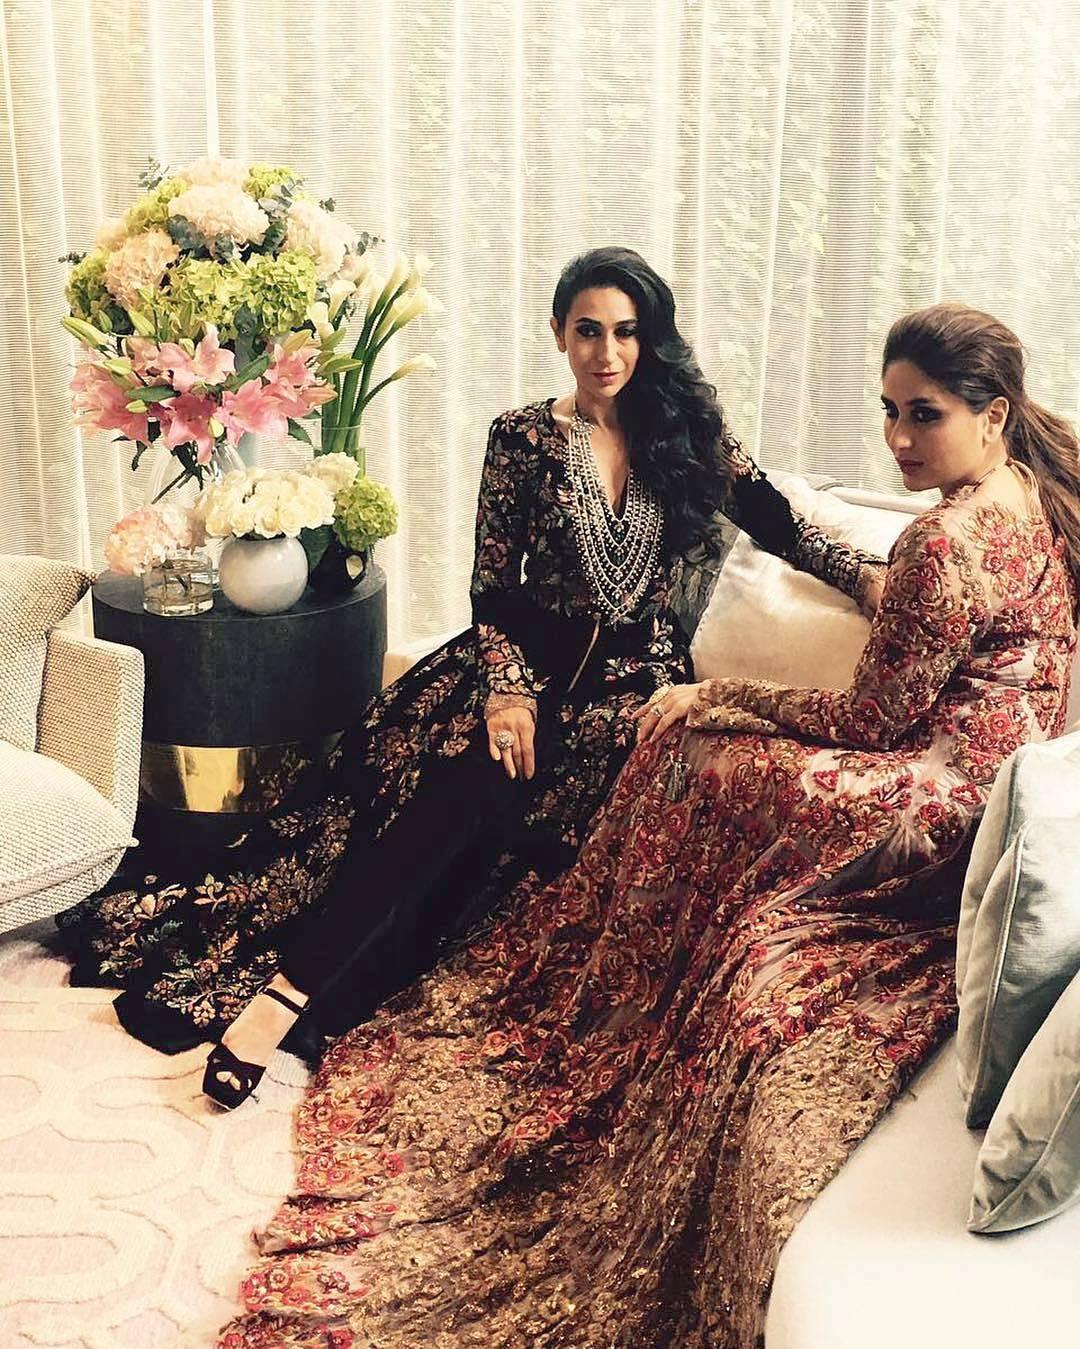 Kareena Kapoor Karisma Kapoor in Manish Malhotra For HELLO Magazine